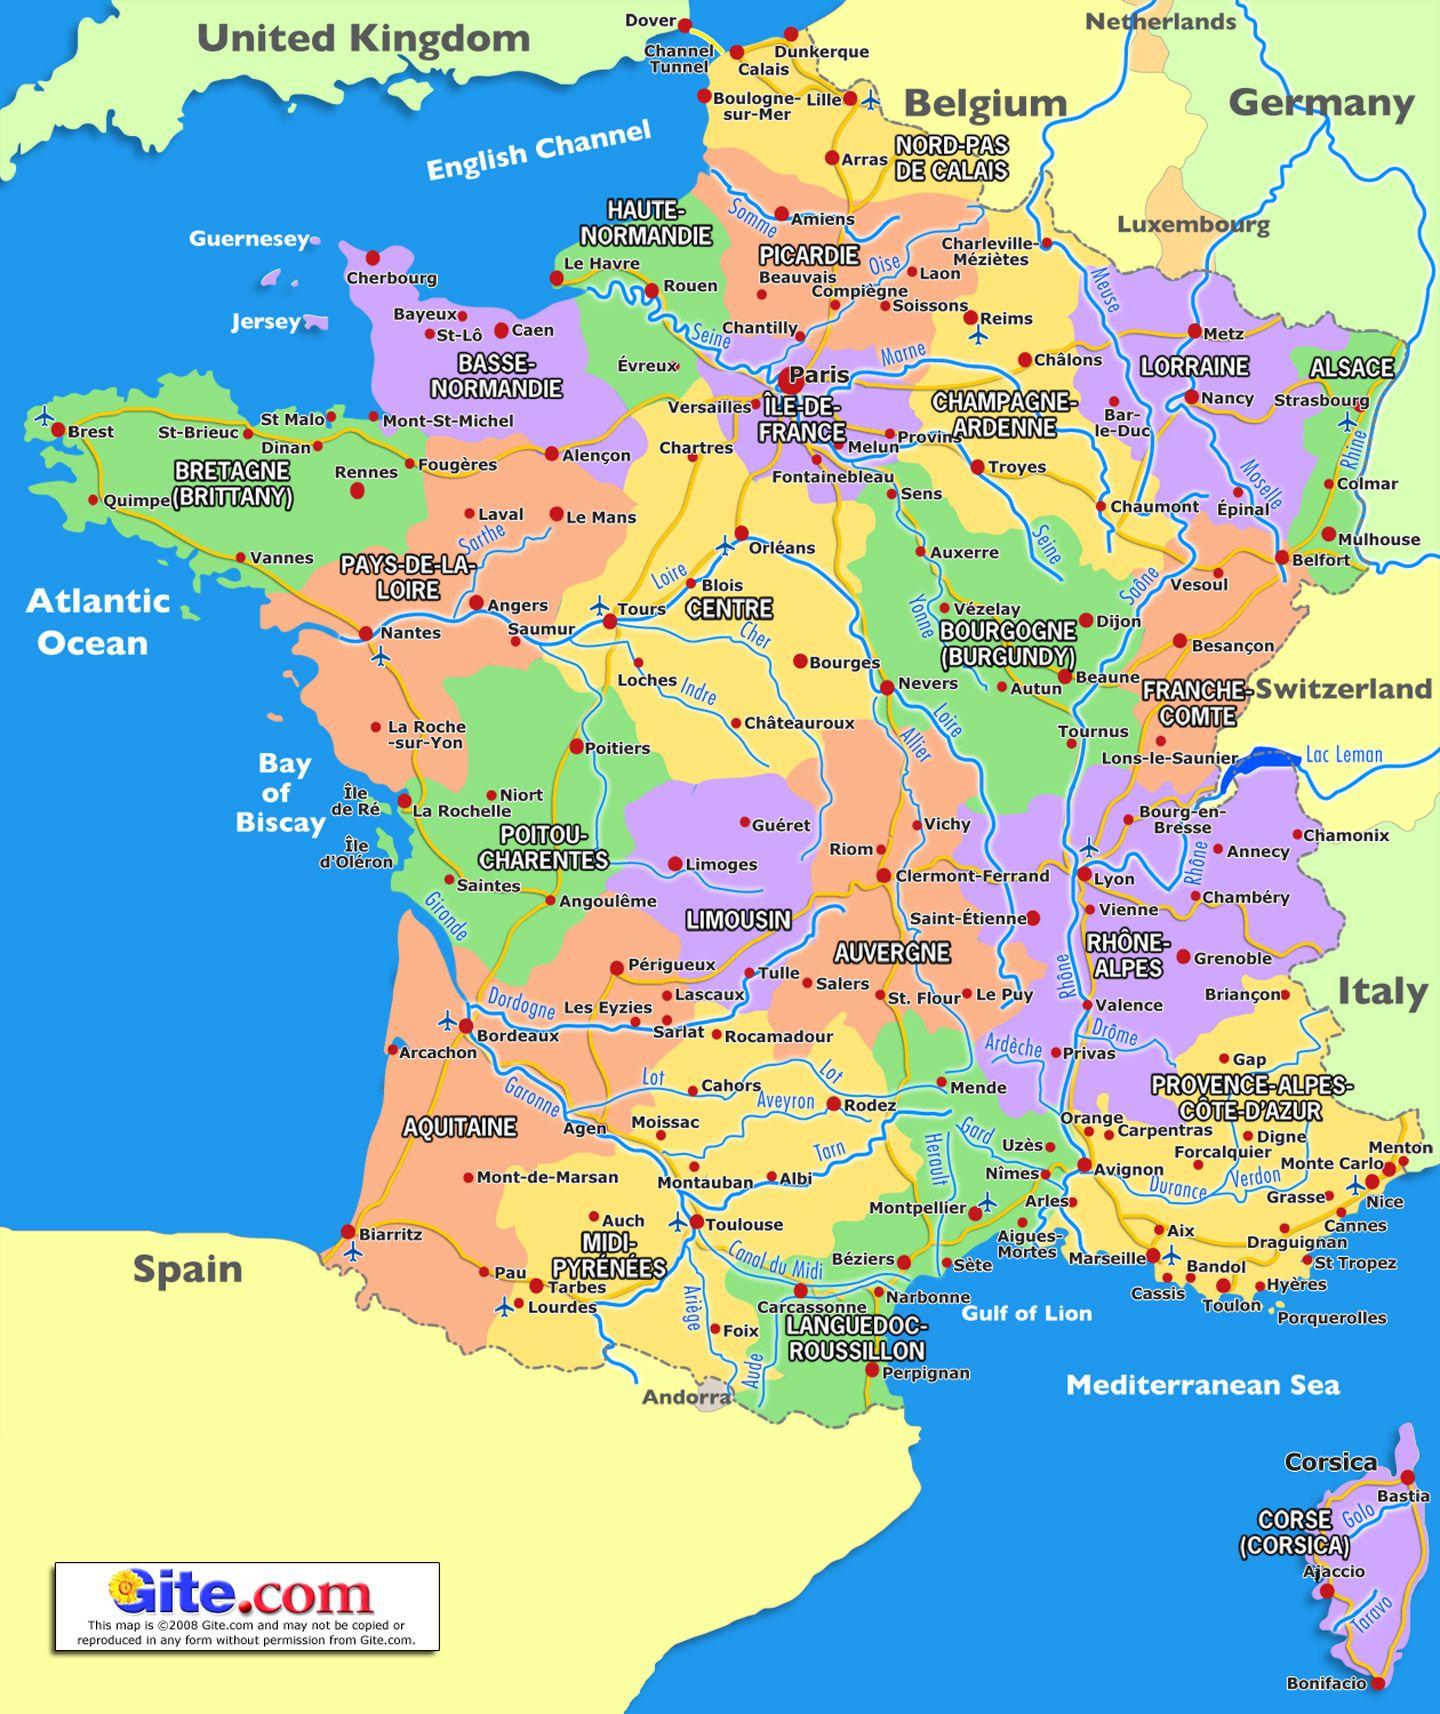 Dorogone region of France mapoffranceregions.jpg